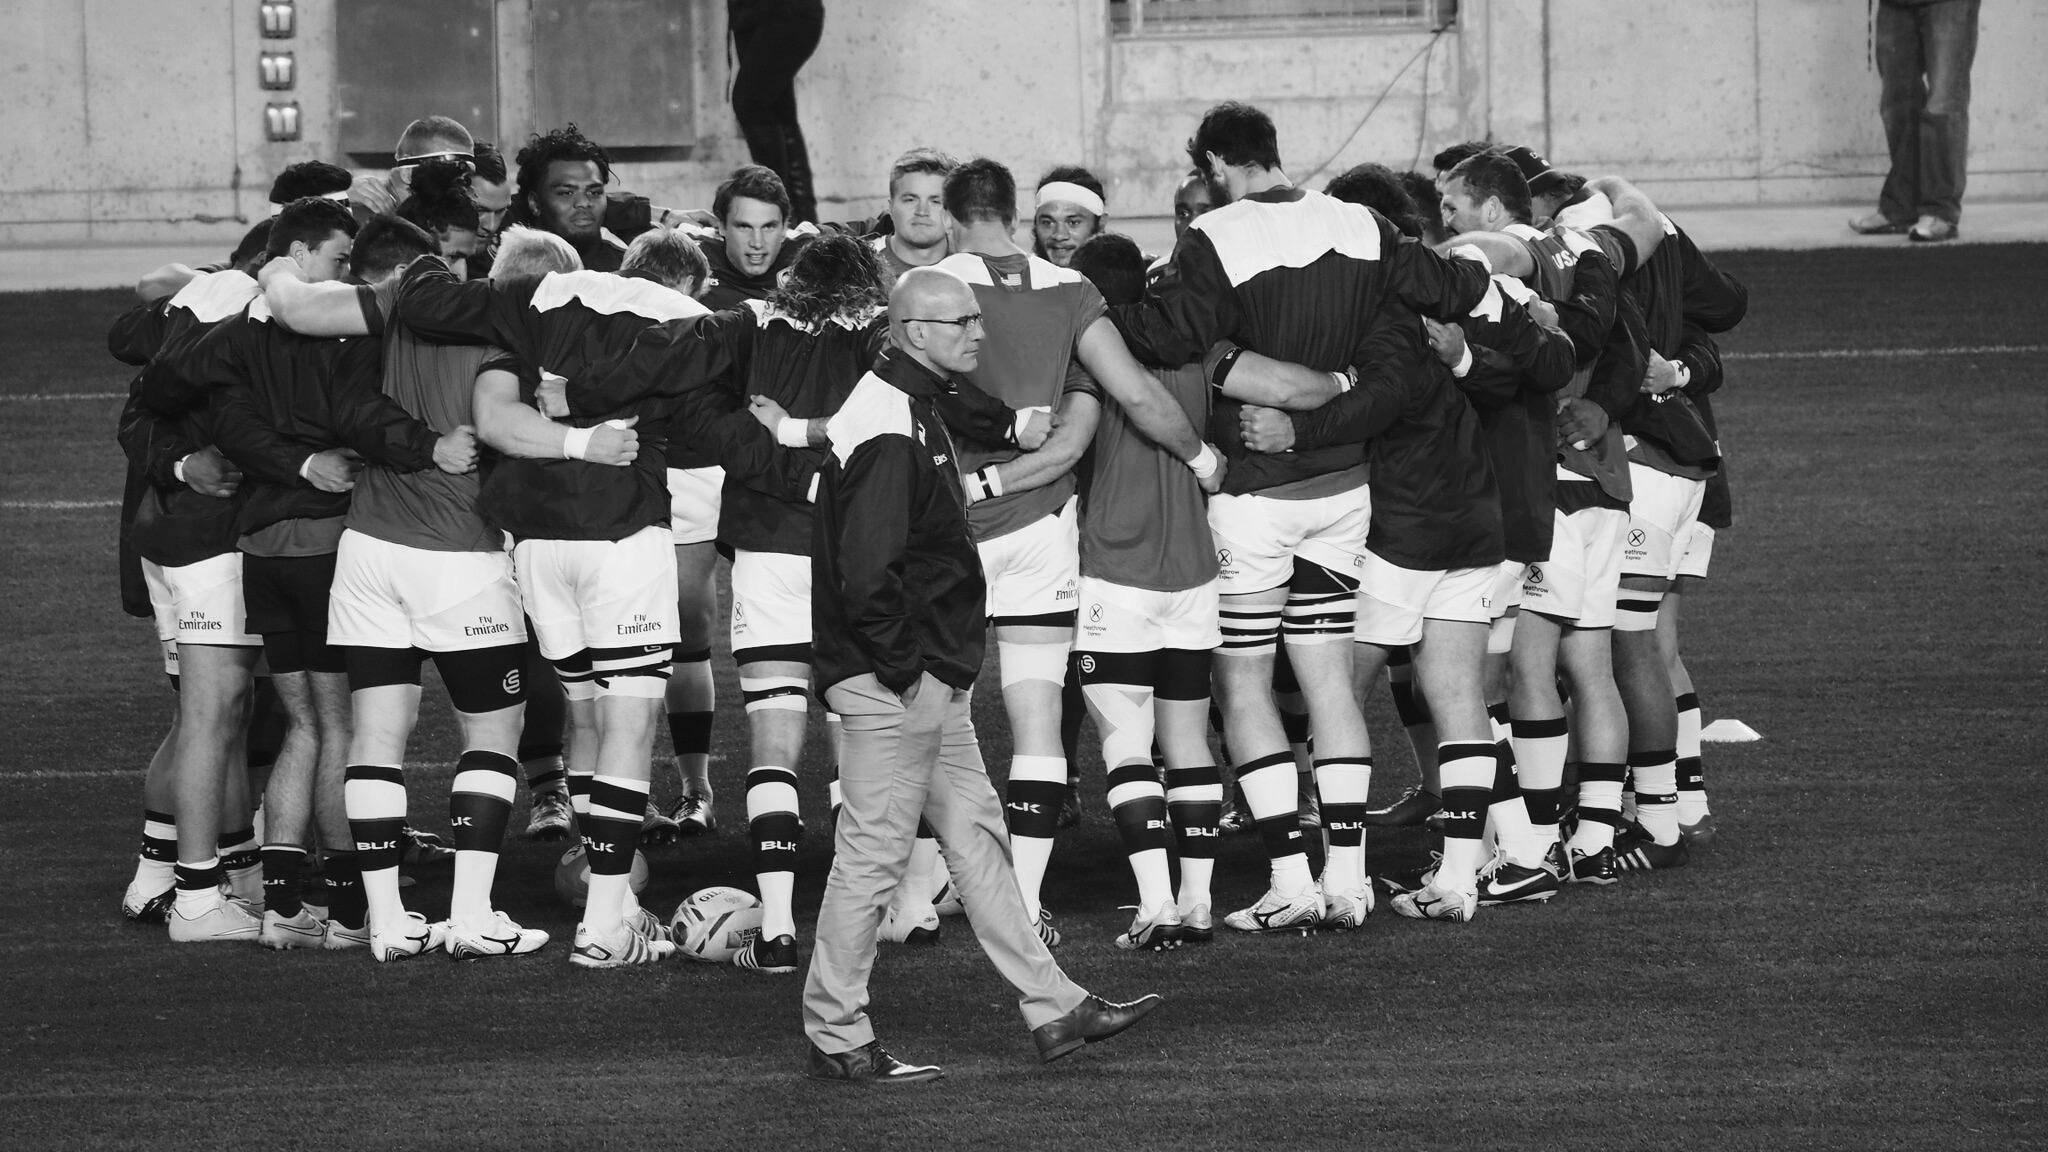 Fostering Leadership Among Athletes